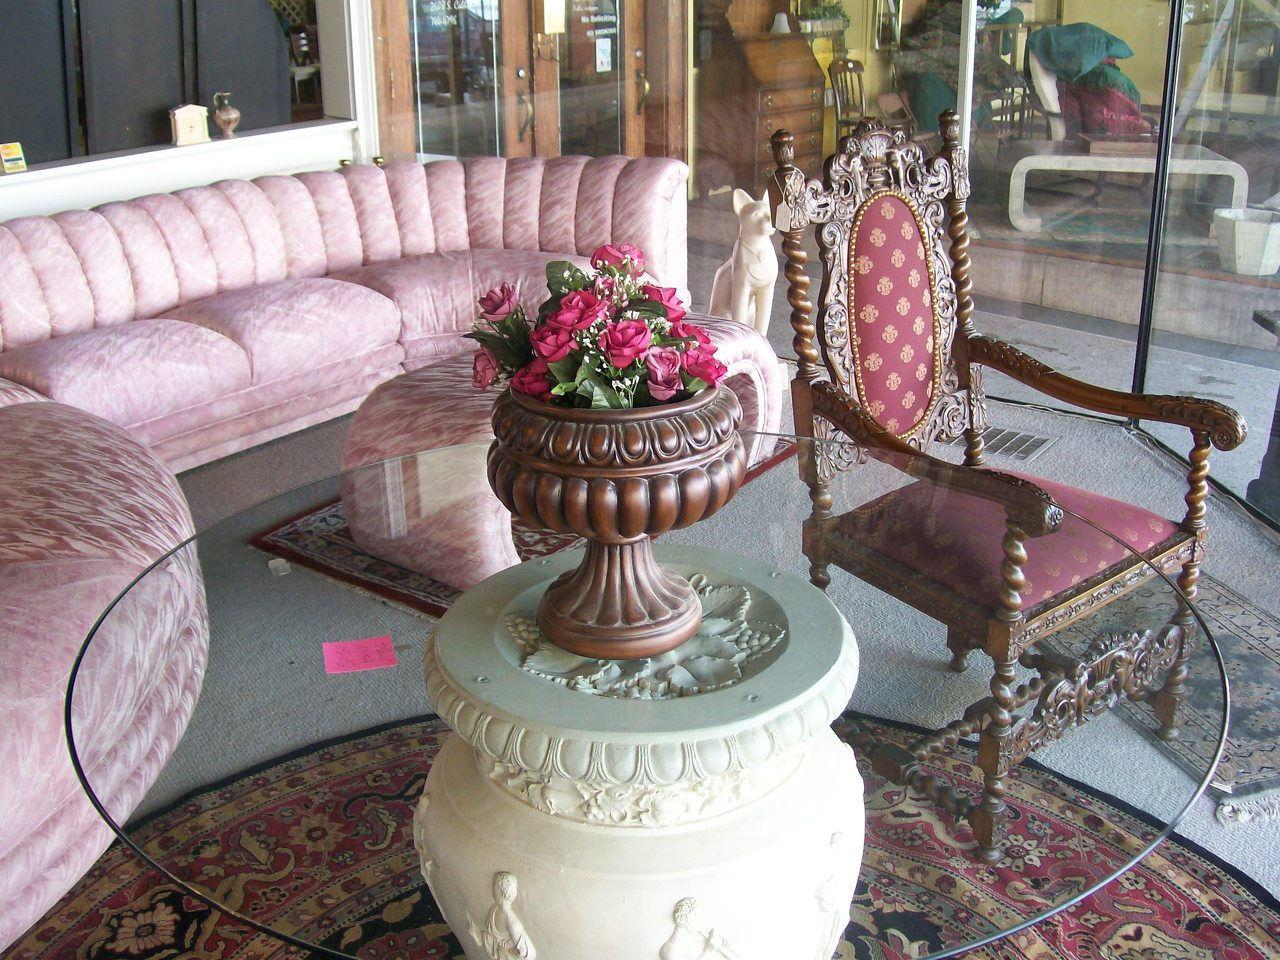 Furniture stores fort wayne indiana - Furniture Stores Fort Wayne Indiana